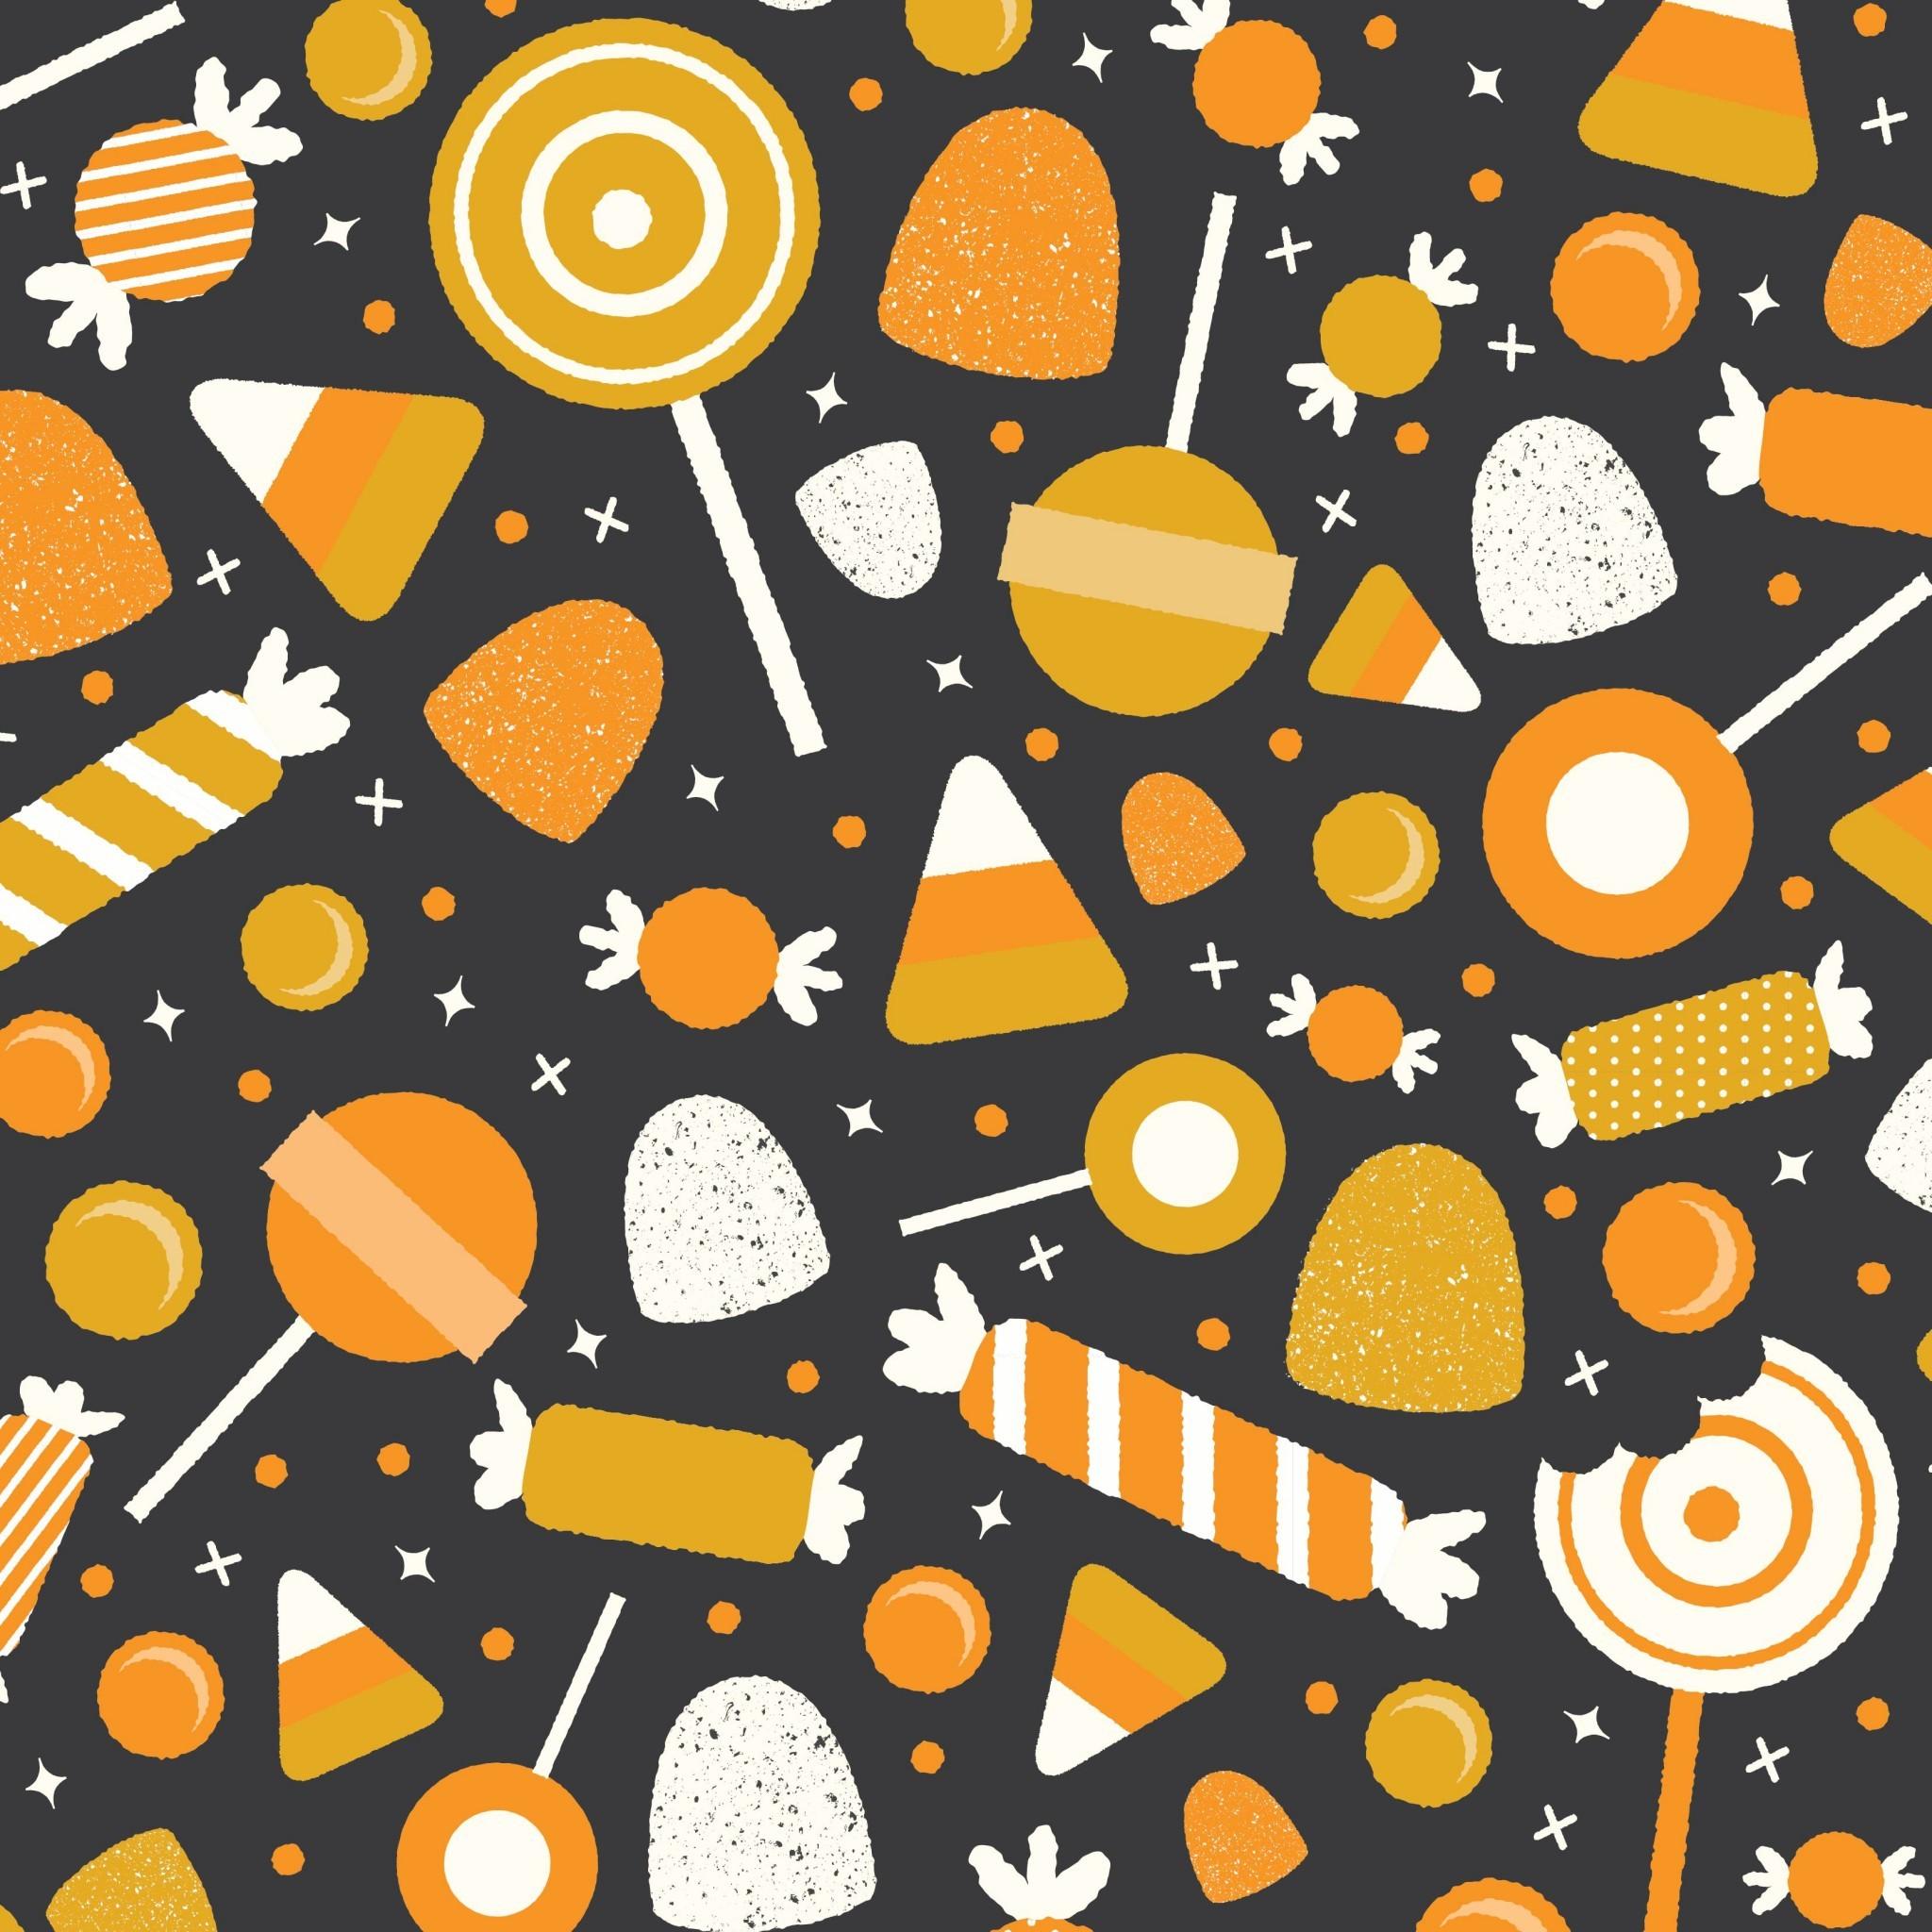 Kawaii Halloween Wallpaper 62 images 2048x2048